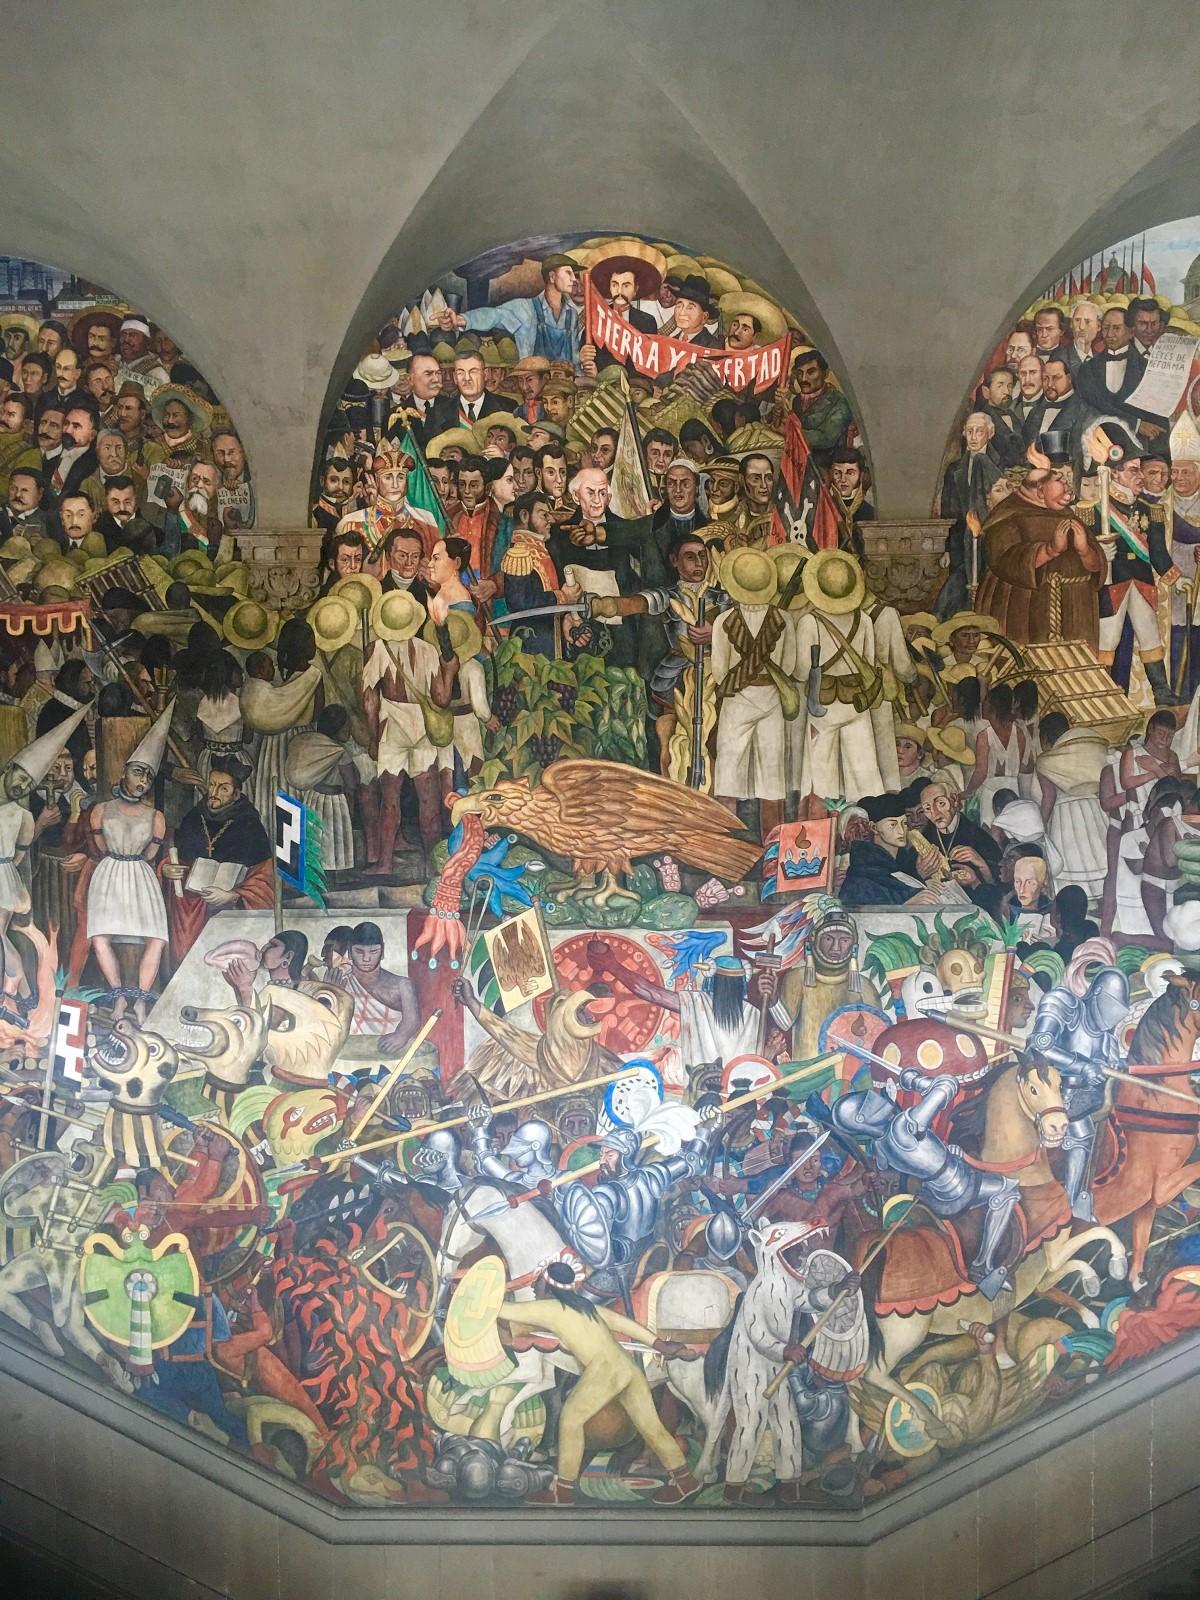 Internship with a project management focus cipa 101 for Diego rivera mural palacio nacional